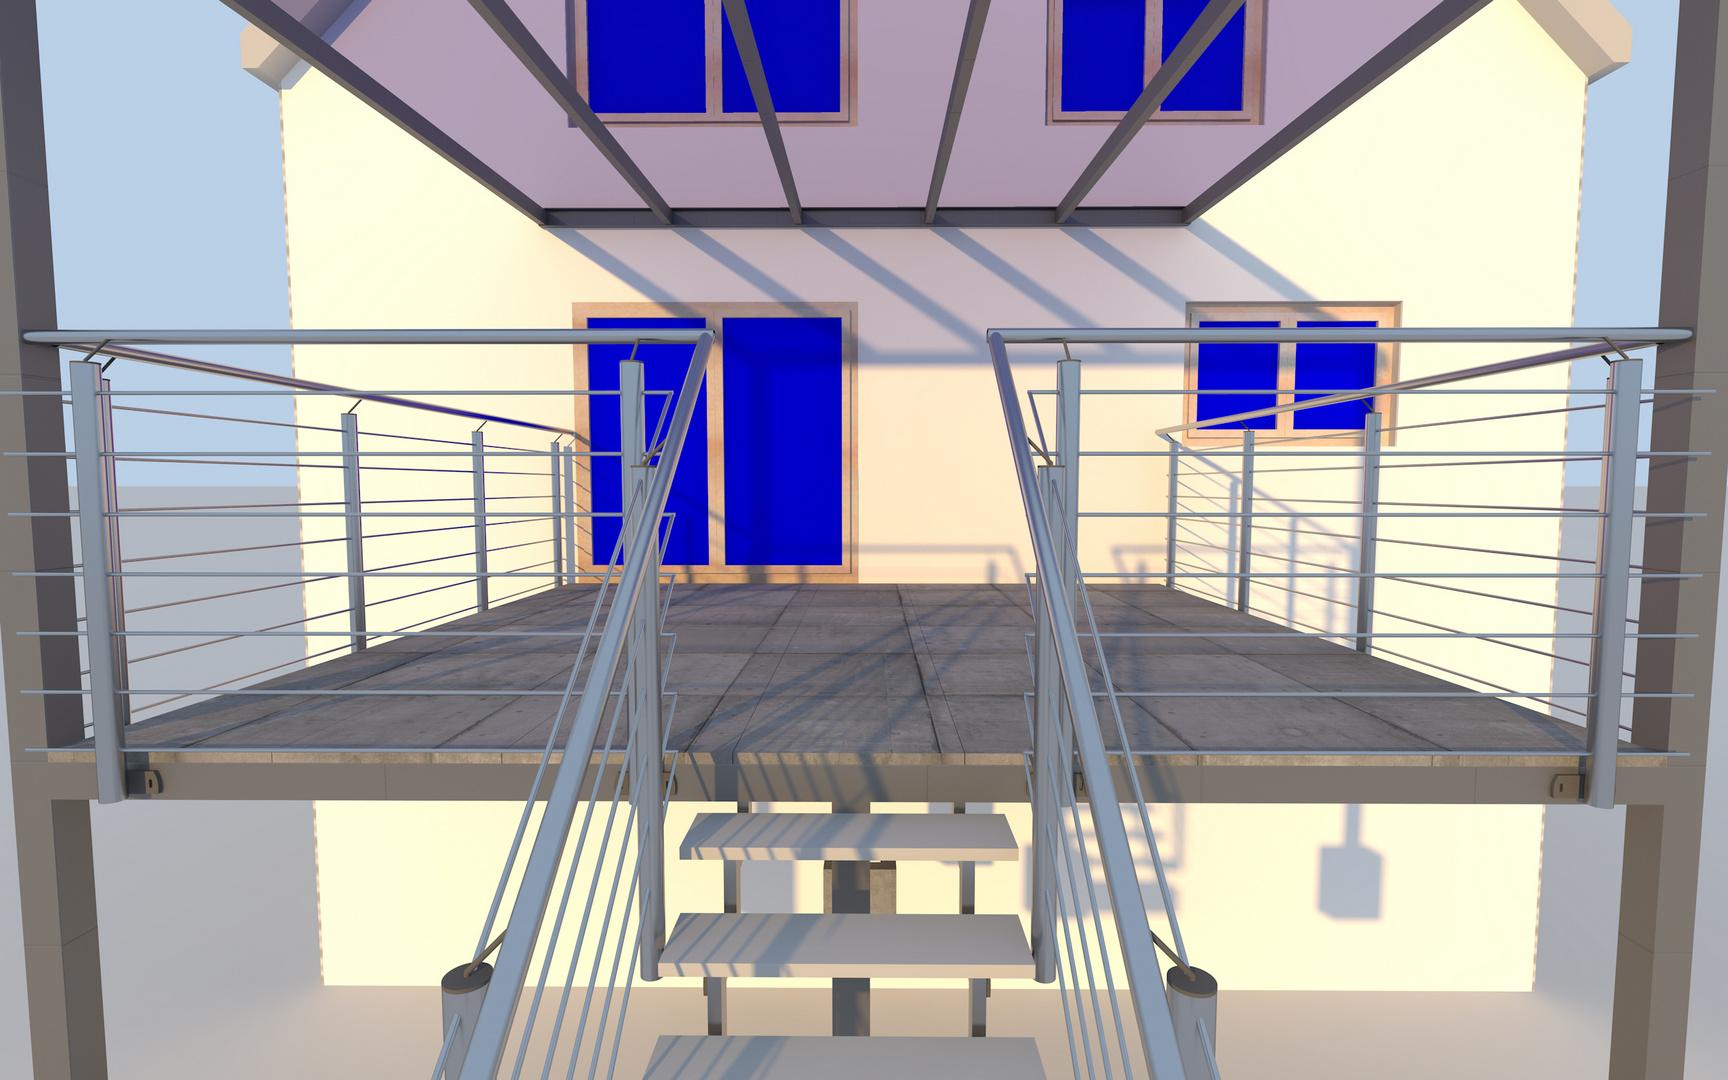 Favorit Terrasse by Aixineering Foto & Bild | digiart, stahlkonstruktion CU99